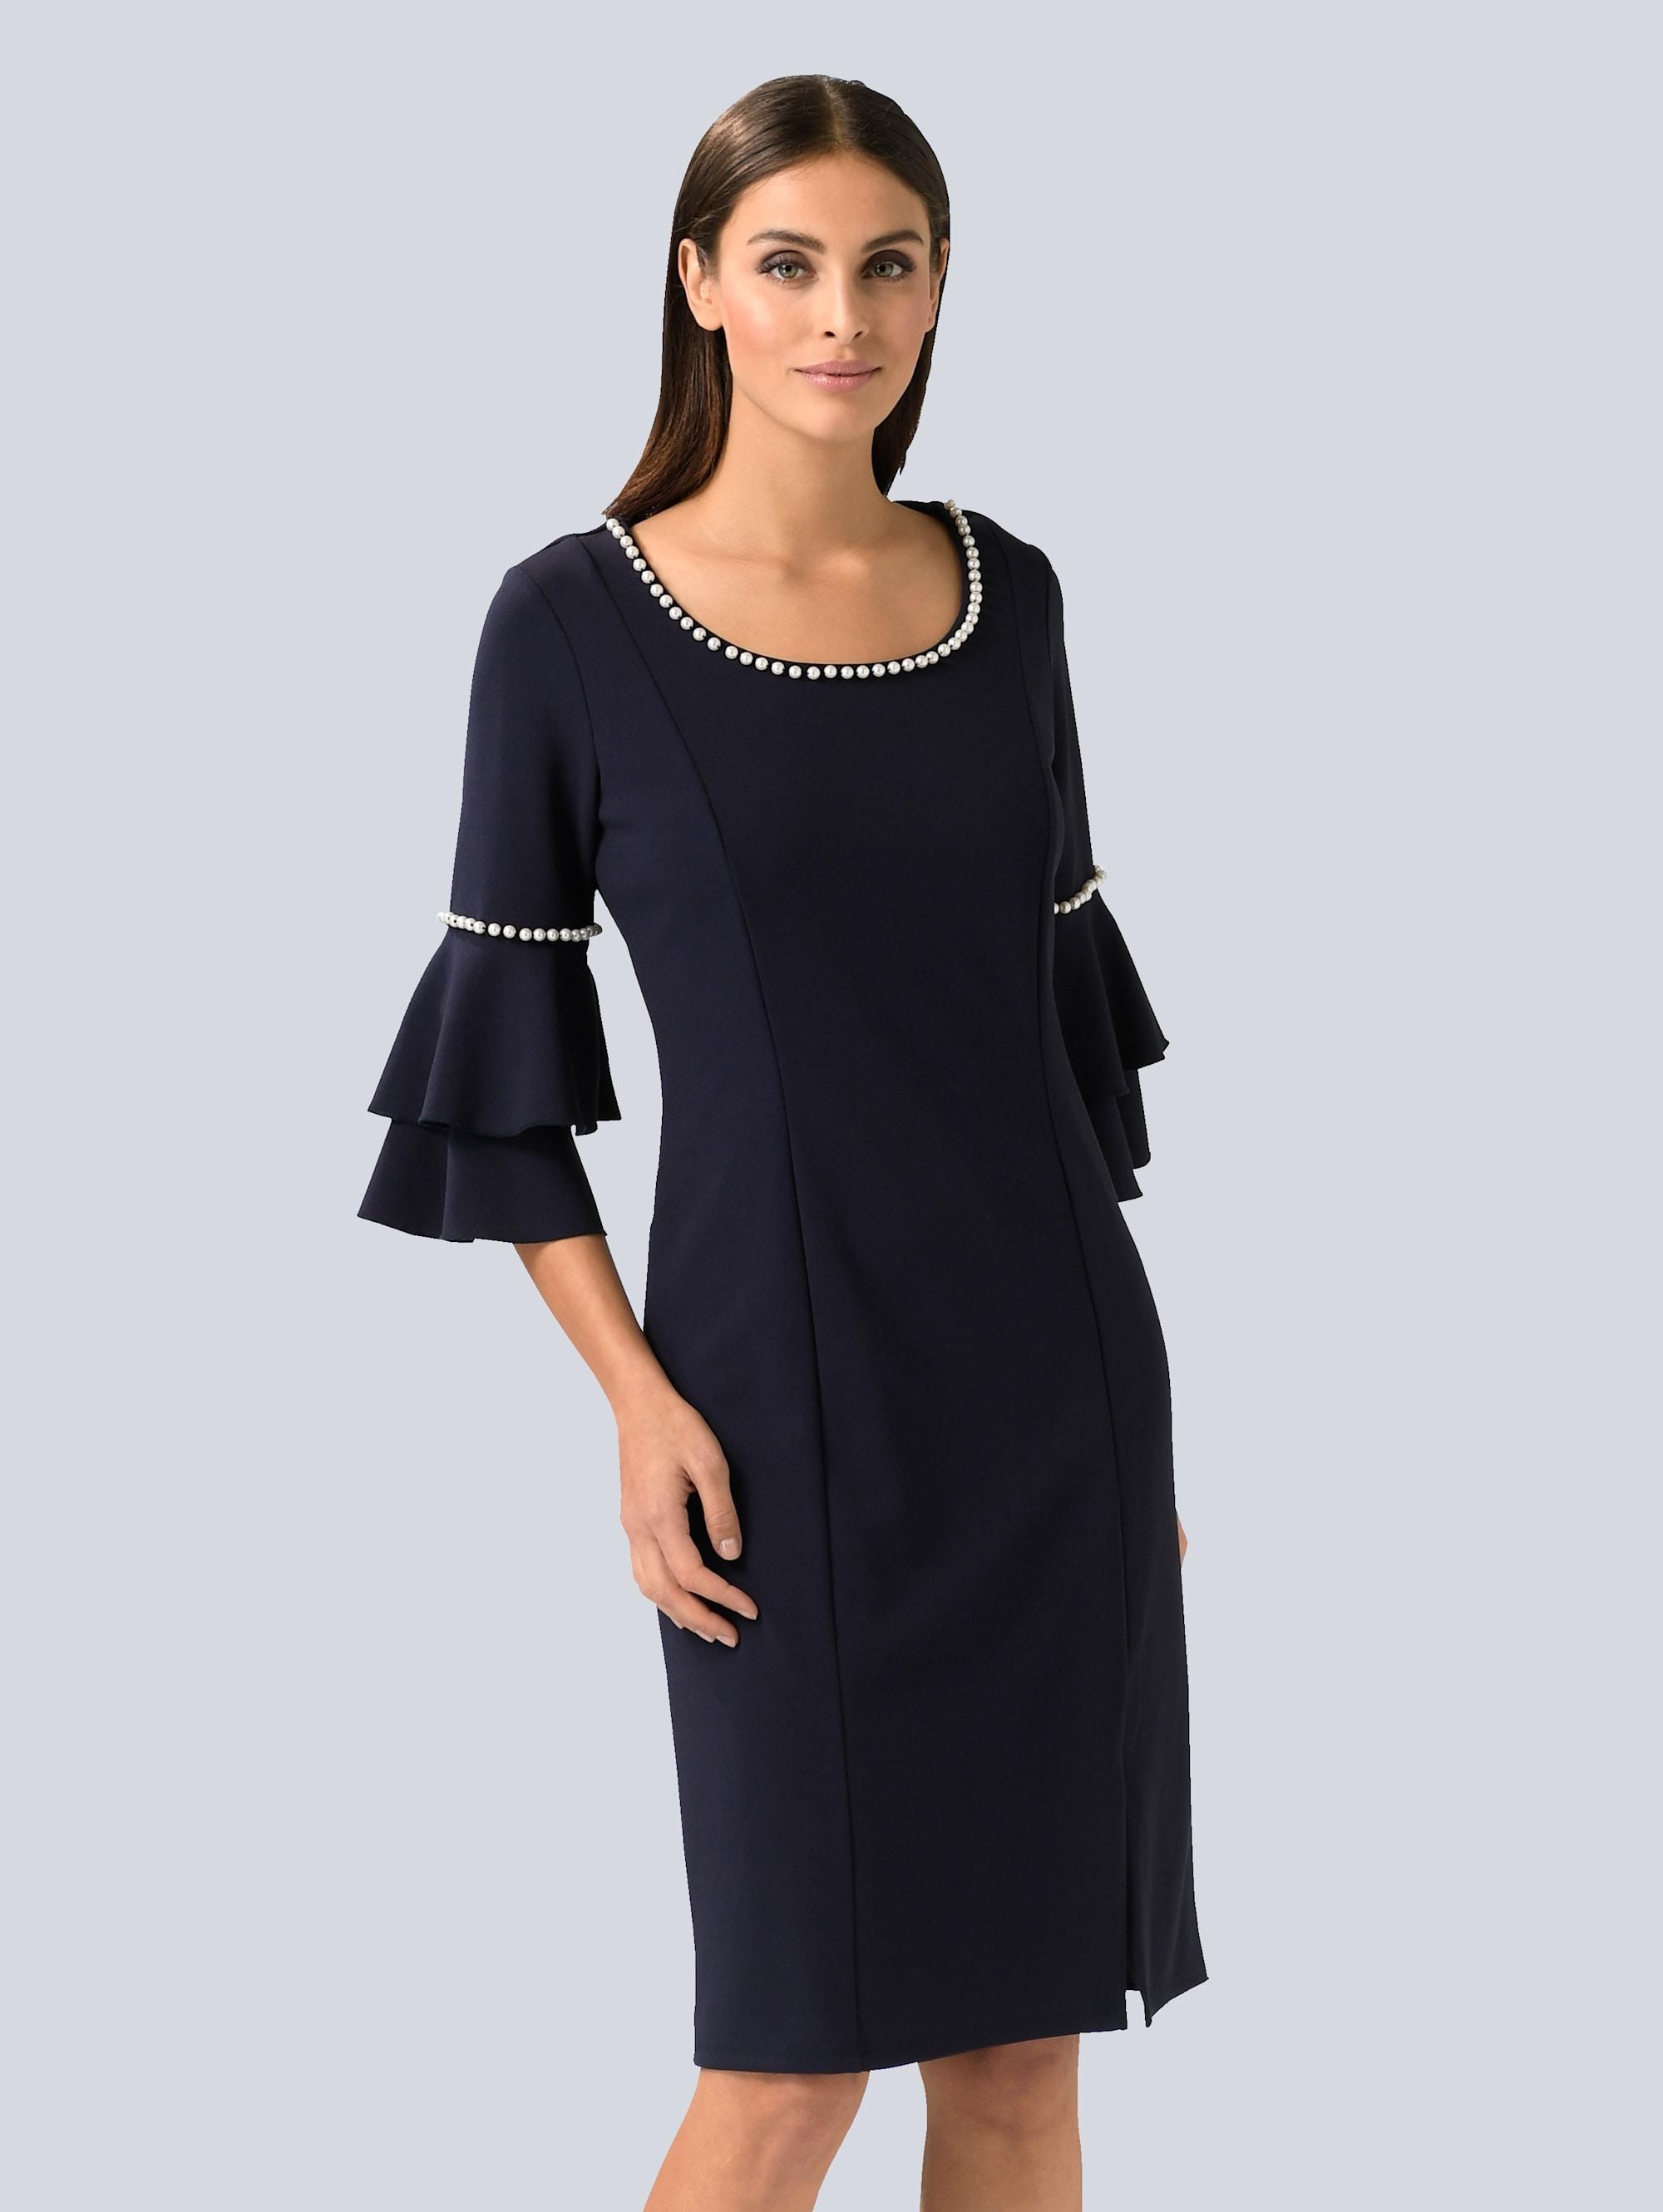 alba moda -  Etuikleid, mit femininen Perlen verziert